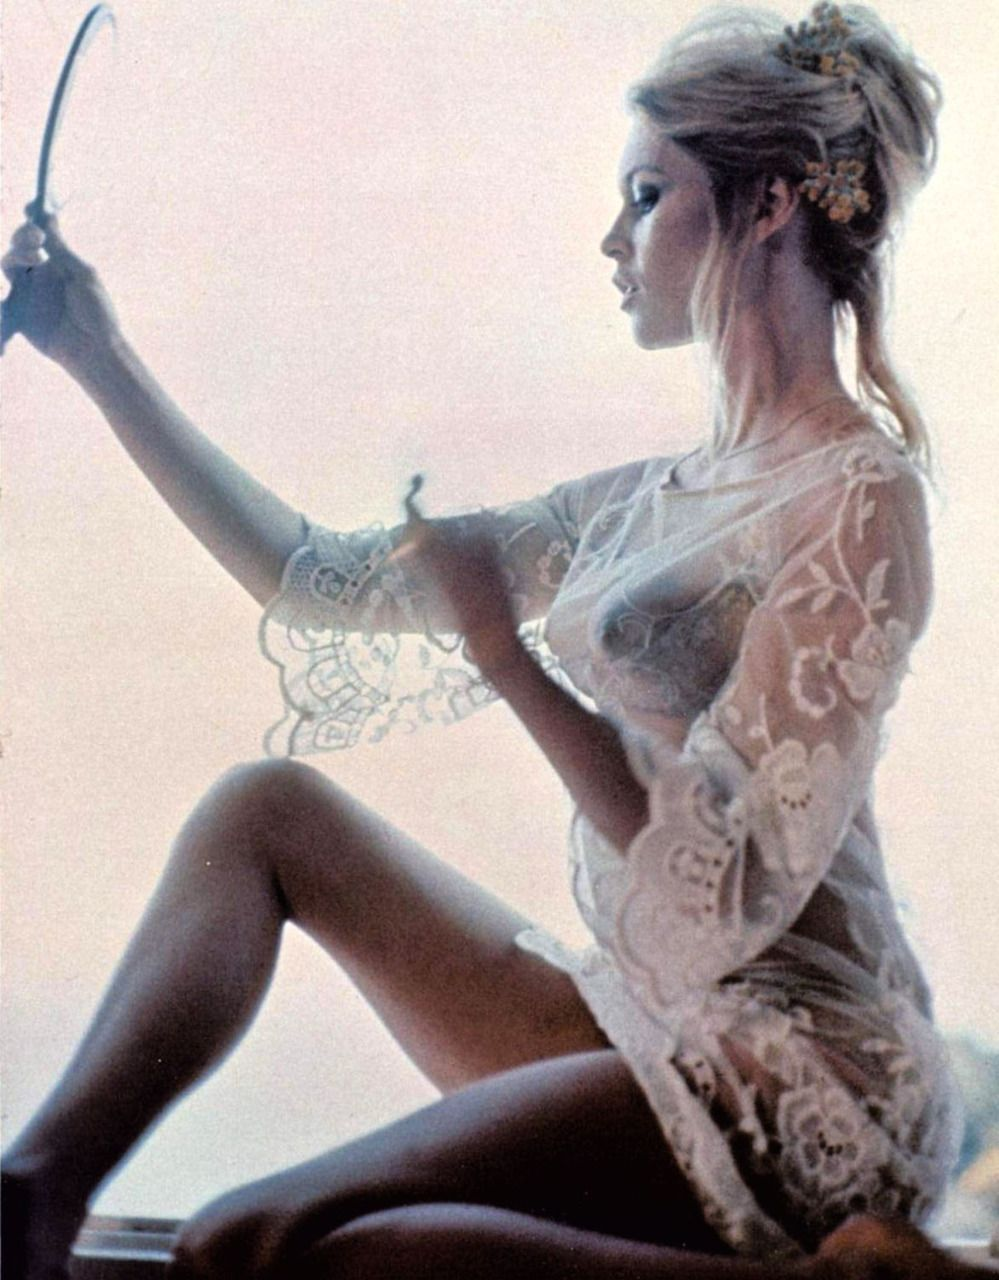 Bardot brigitte nude, free naked chicks pics